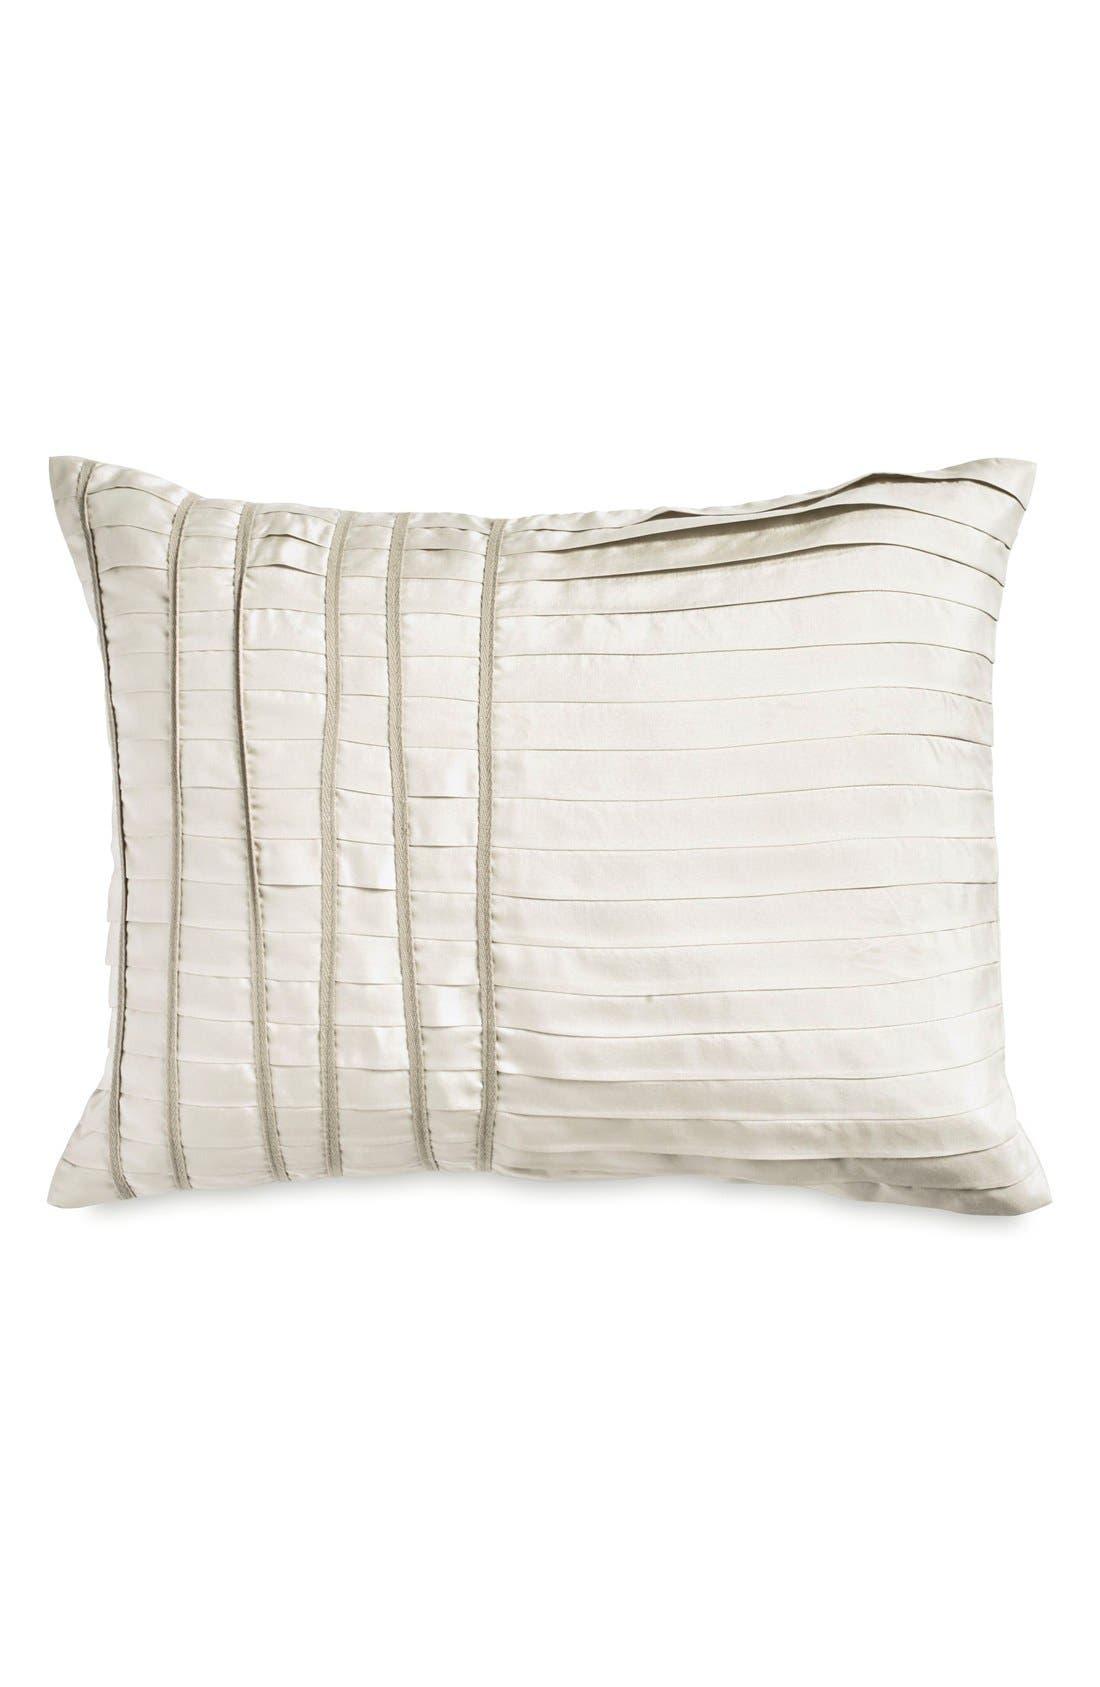 Donna Karan Collection 'Silk Essentials' Pillow,                         Main,                         color, Pearl